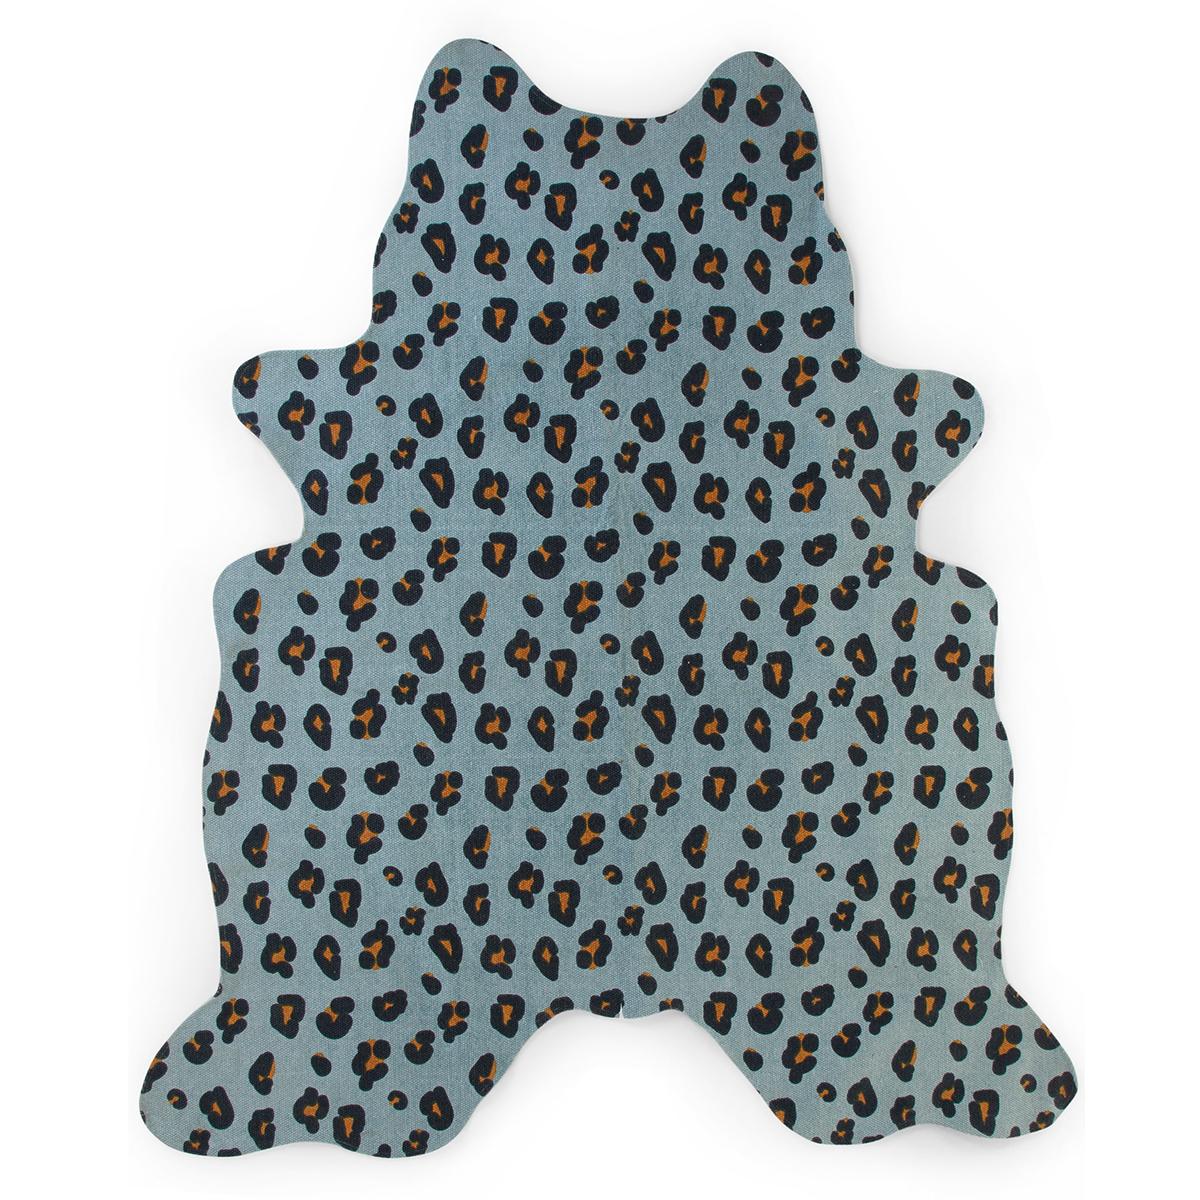 Tapis Tapis Leopard Bleu - 145 x 160 cm Tapis Leopard Bleu - 145 x 160 cm